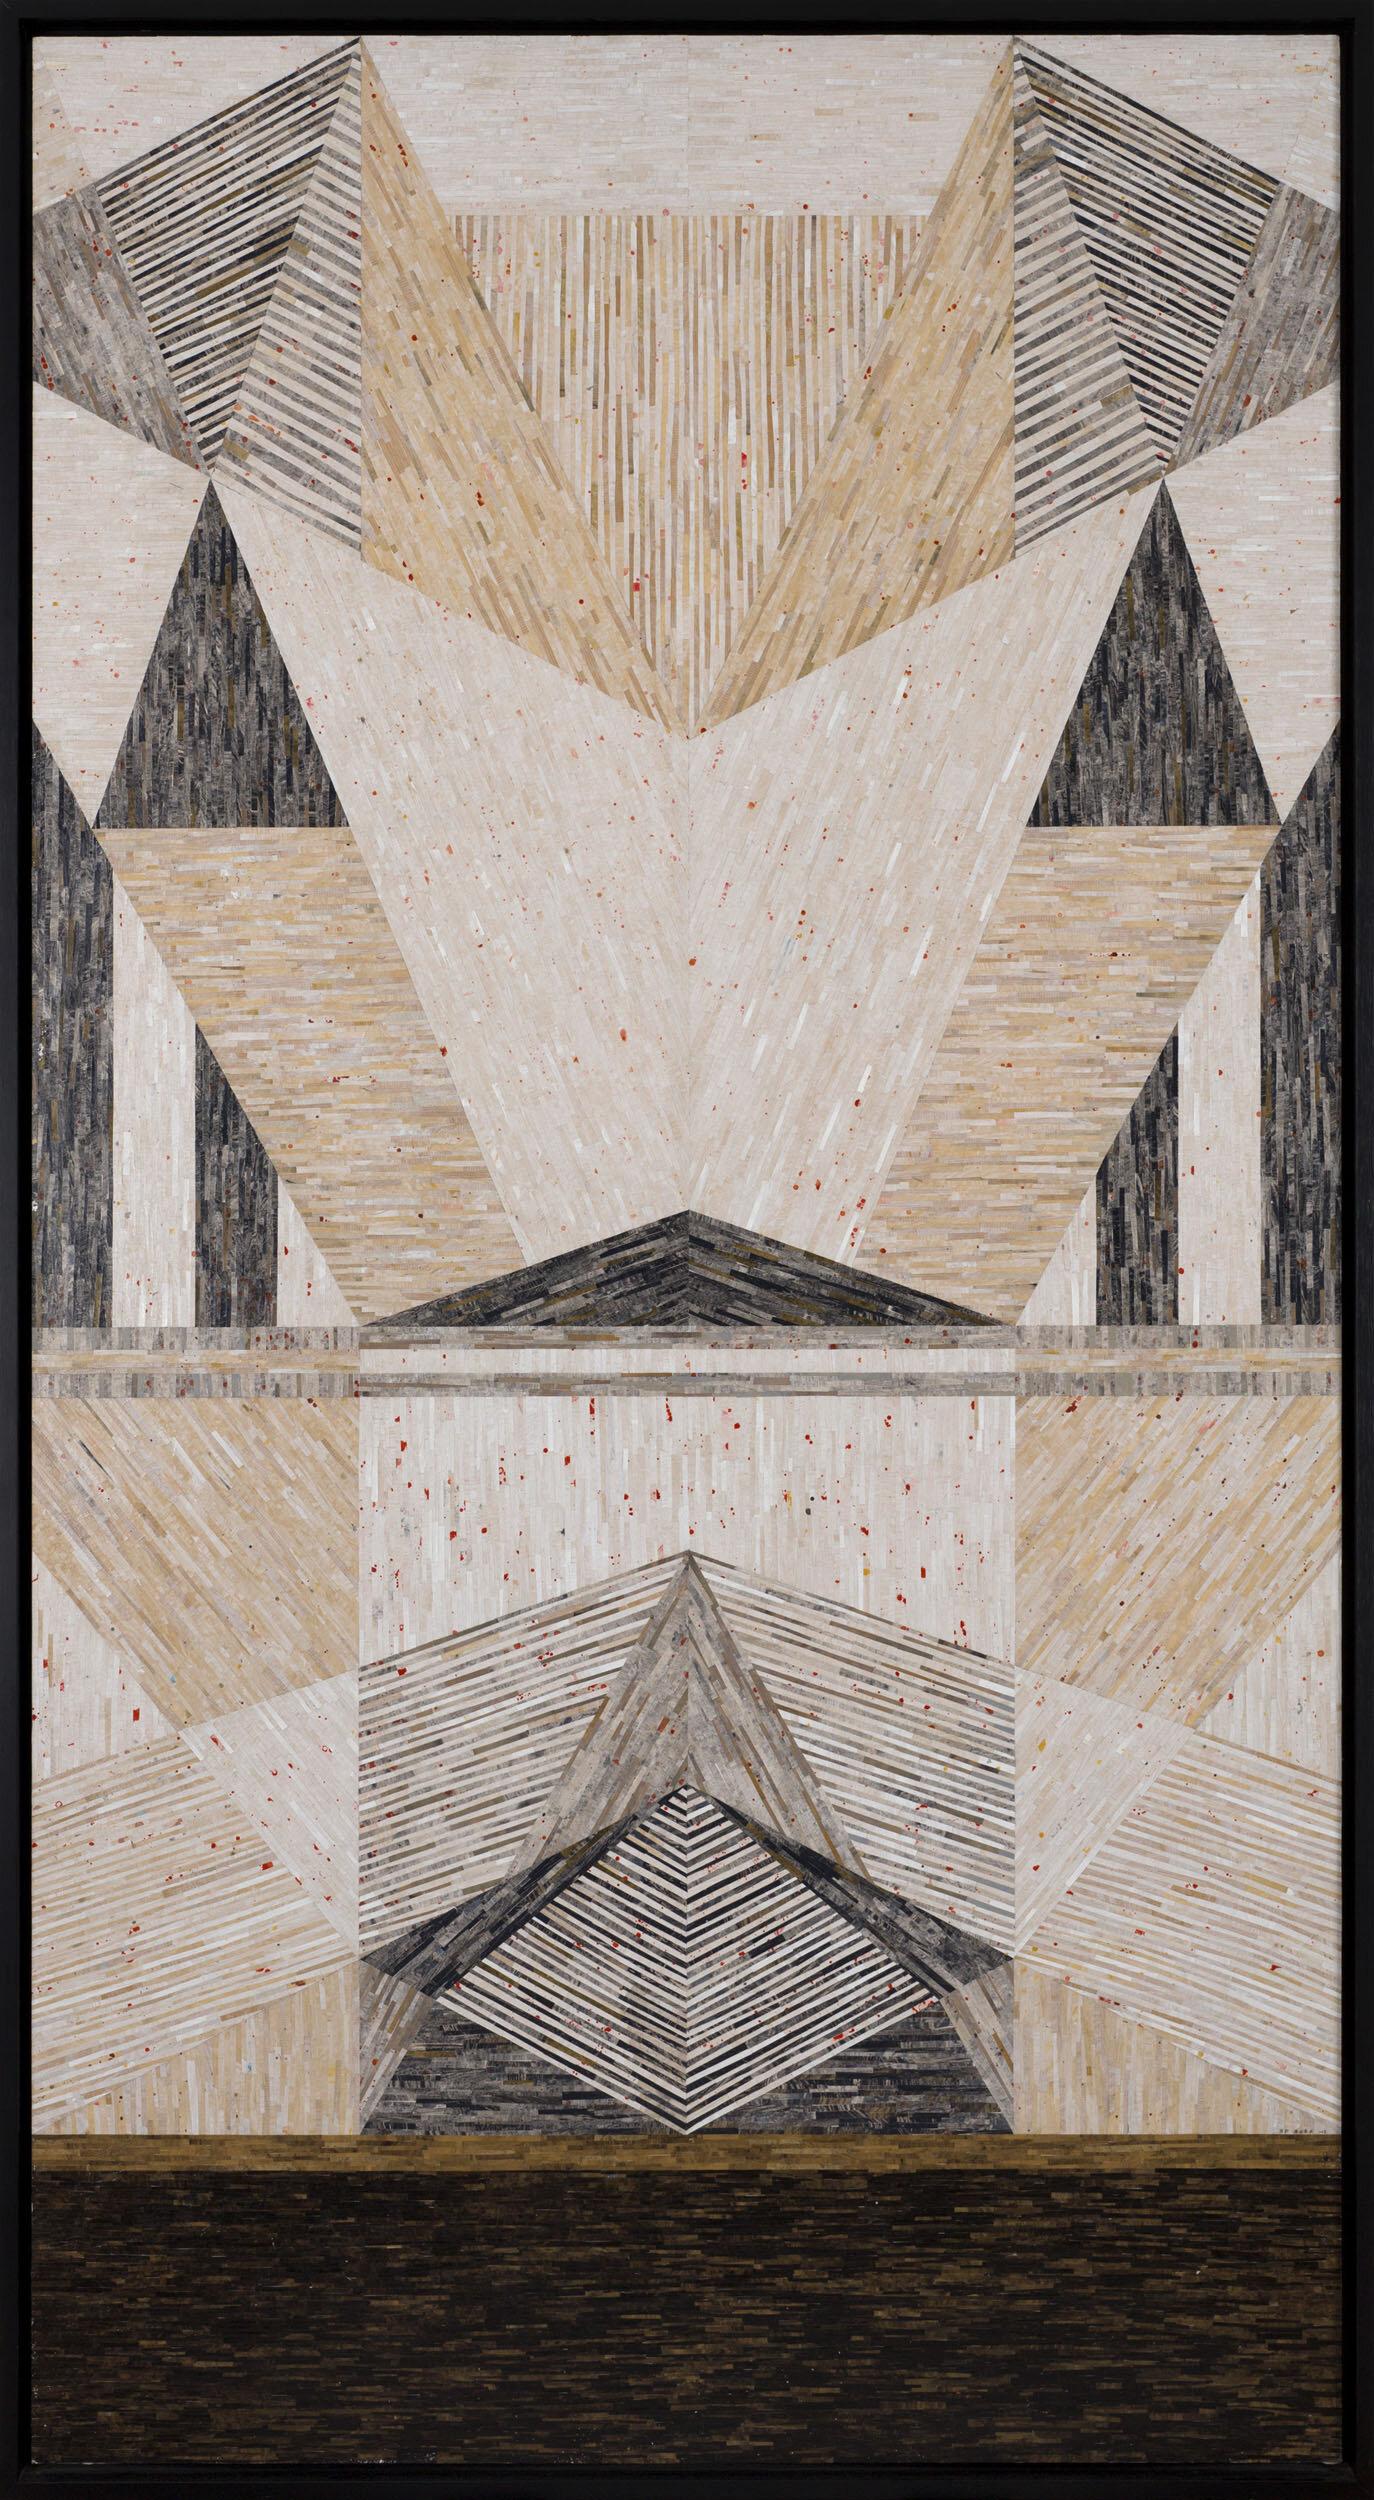 Rebecka Bebben Andersson   The End (poison)  2012 Signerad och daterad Collage, papper 208 x 111,5 cm